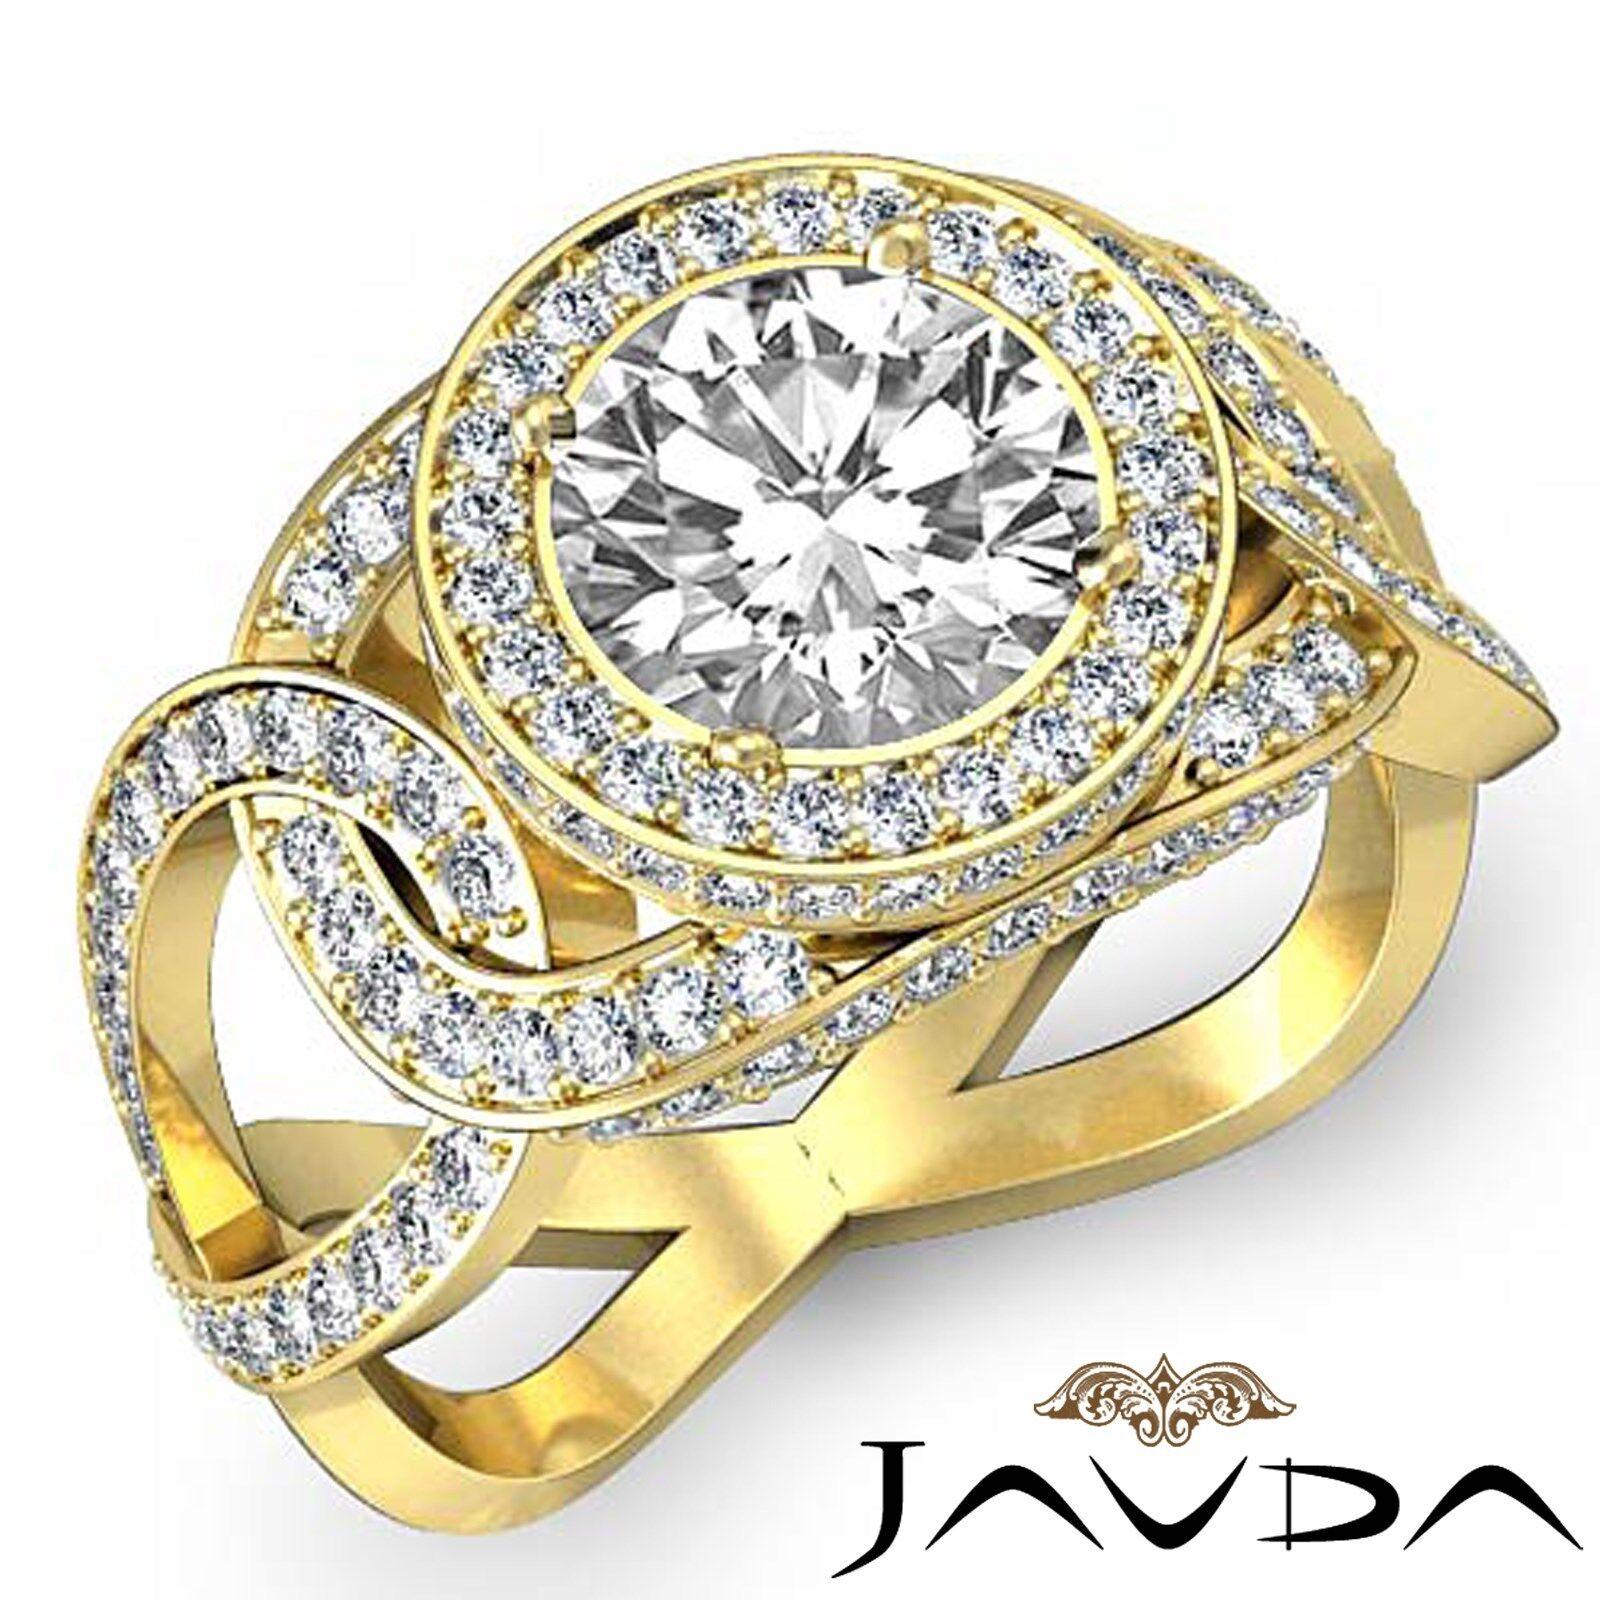 Circa Halo Infinity Twisted Shank Round Diamond Engagement Ring GIA H VS2 2.8Ct